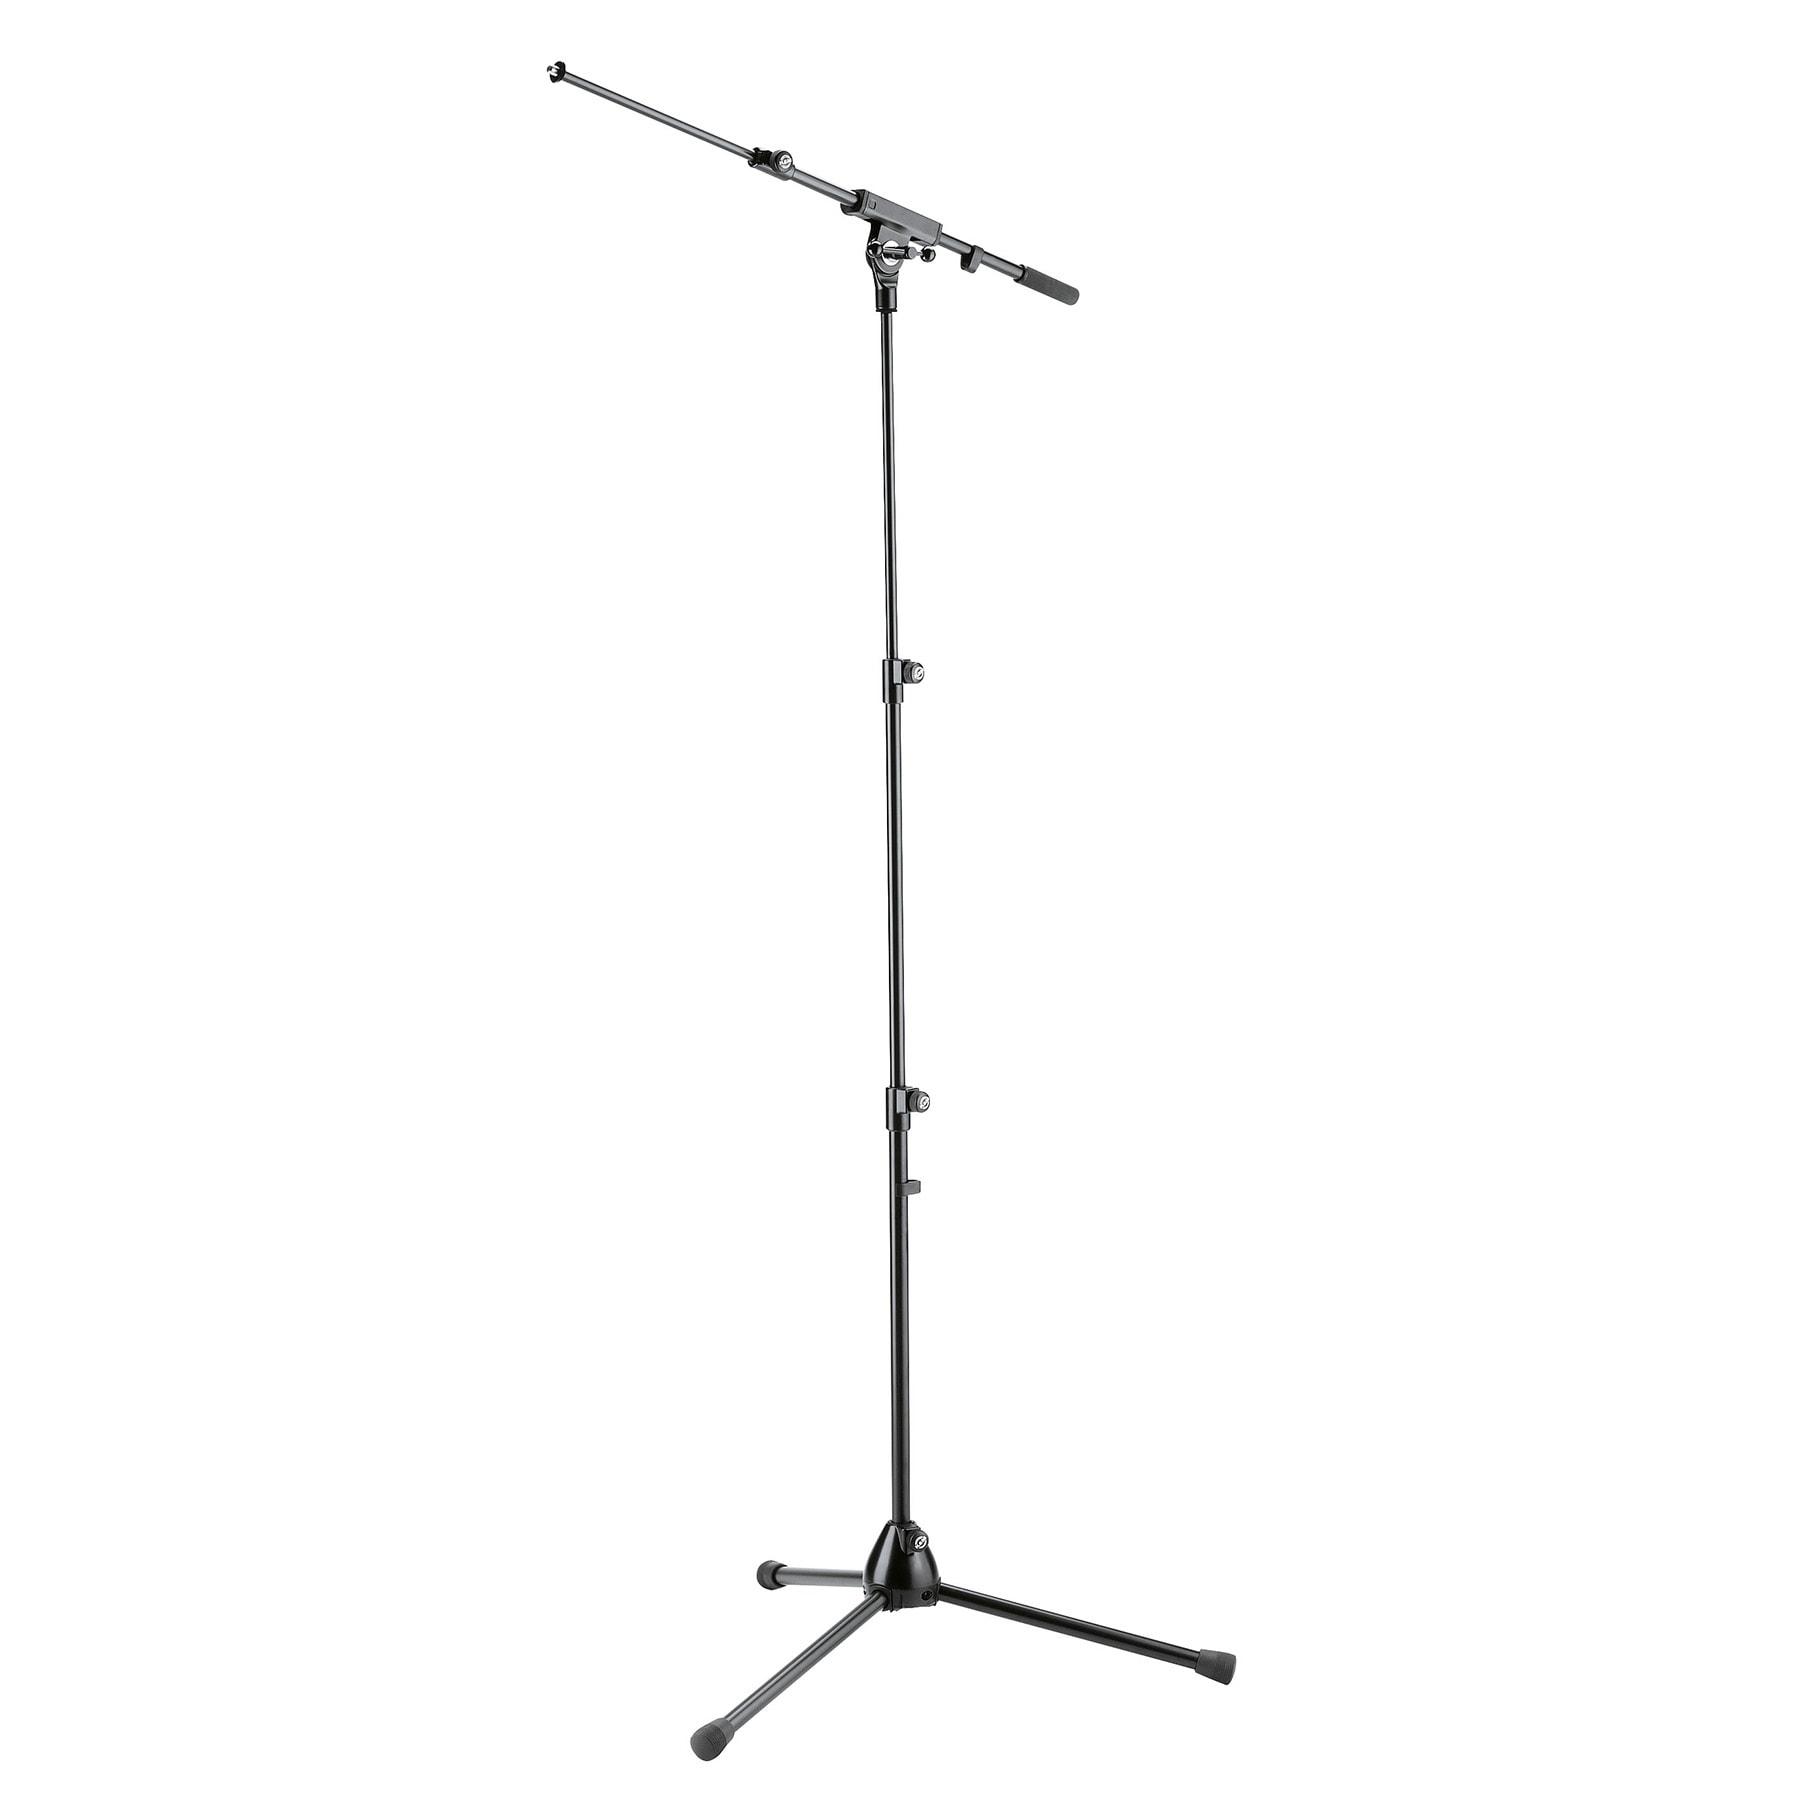 KM252 - Microphone stand